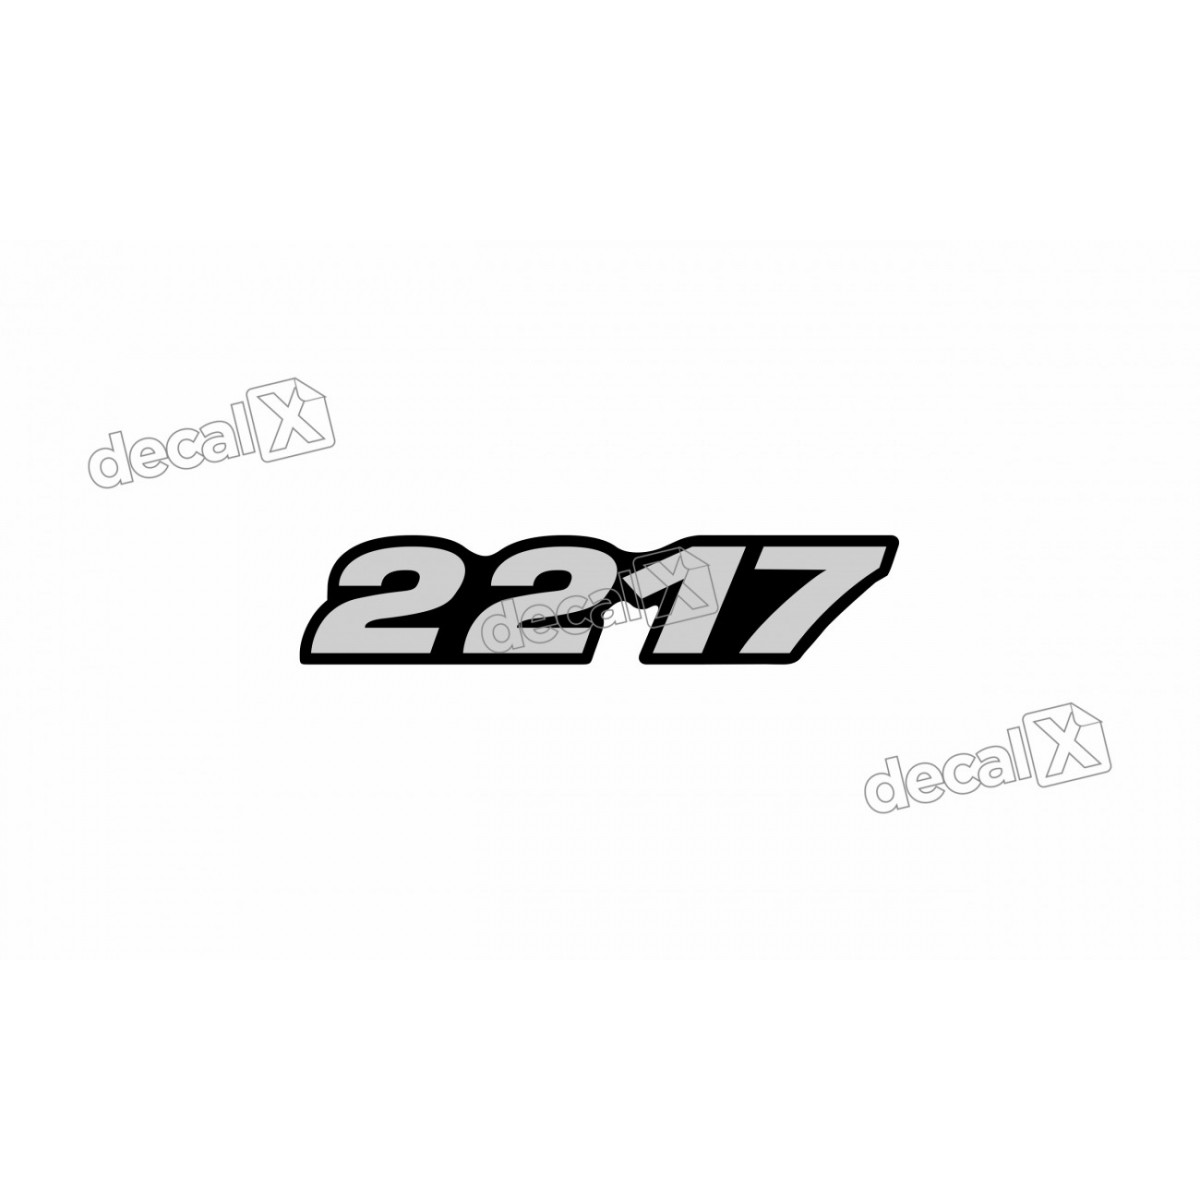 Adesivo Emblema Resinado Mercedes 2217 Cm79 Decalx